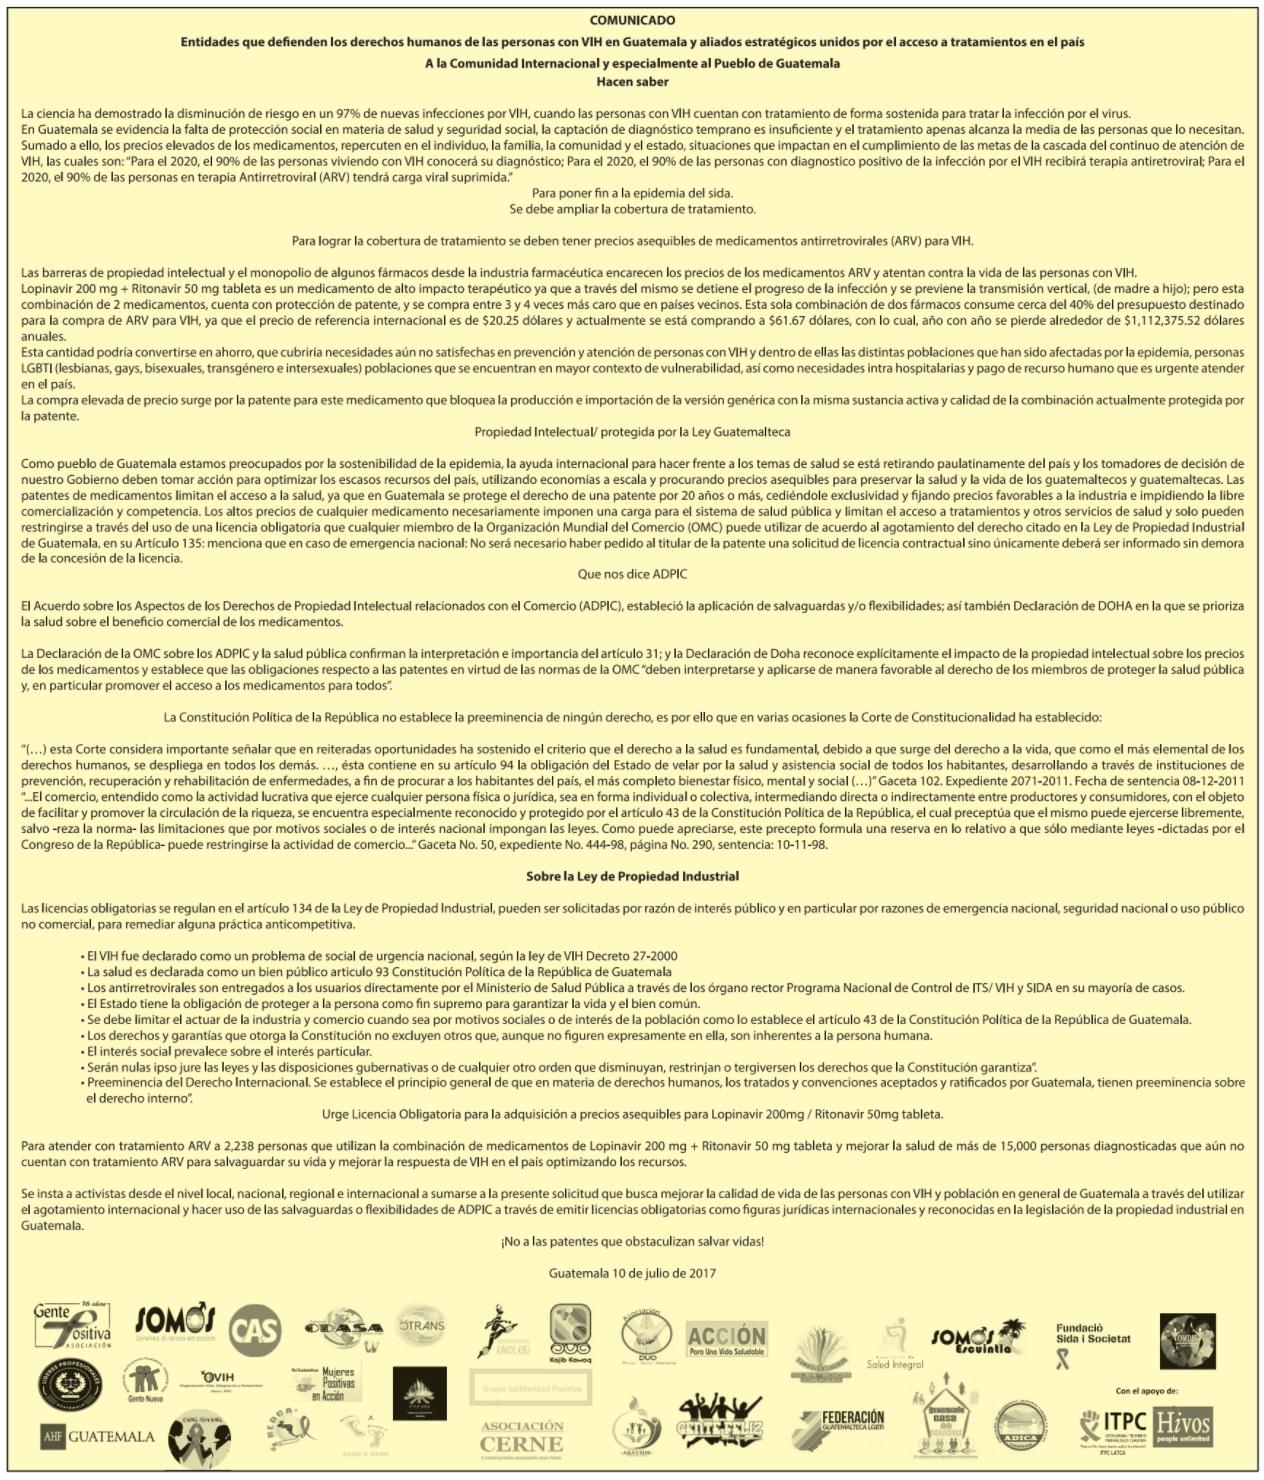 Comunicado de Prensa ITPC-LATCA 10julio2017 wb